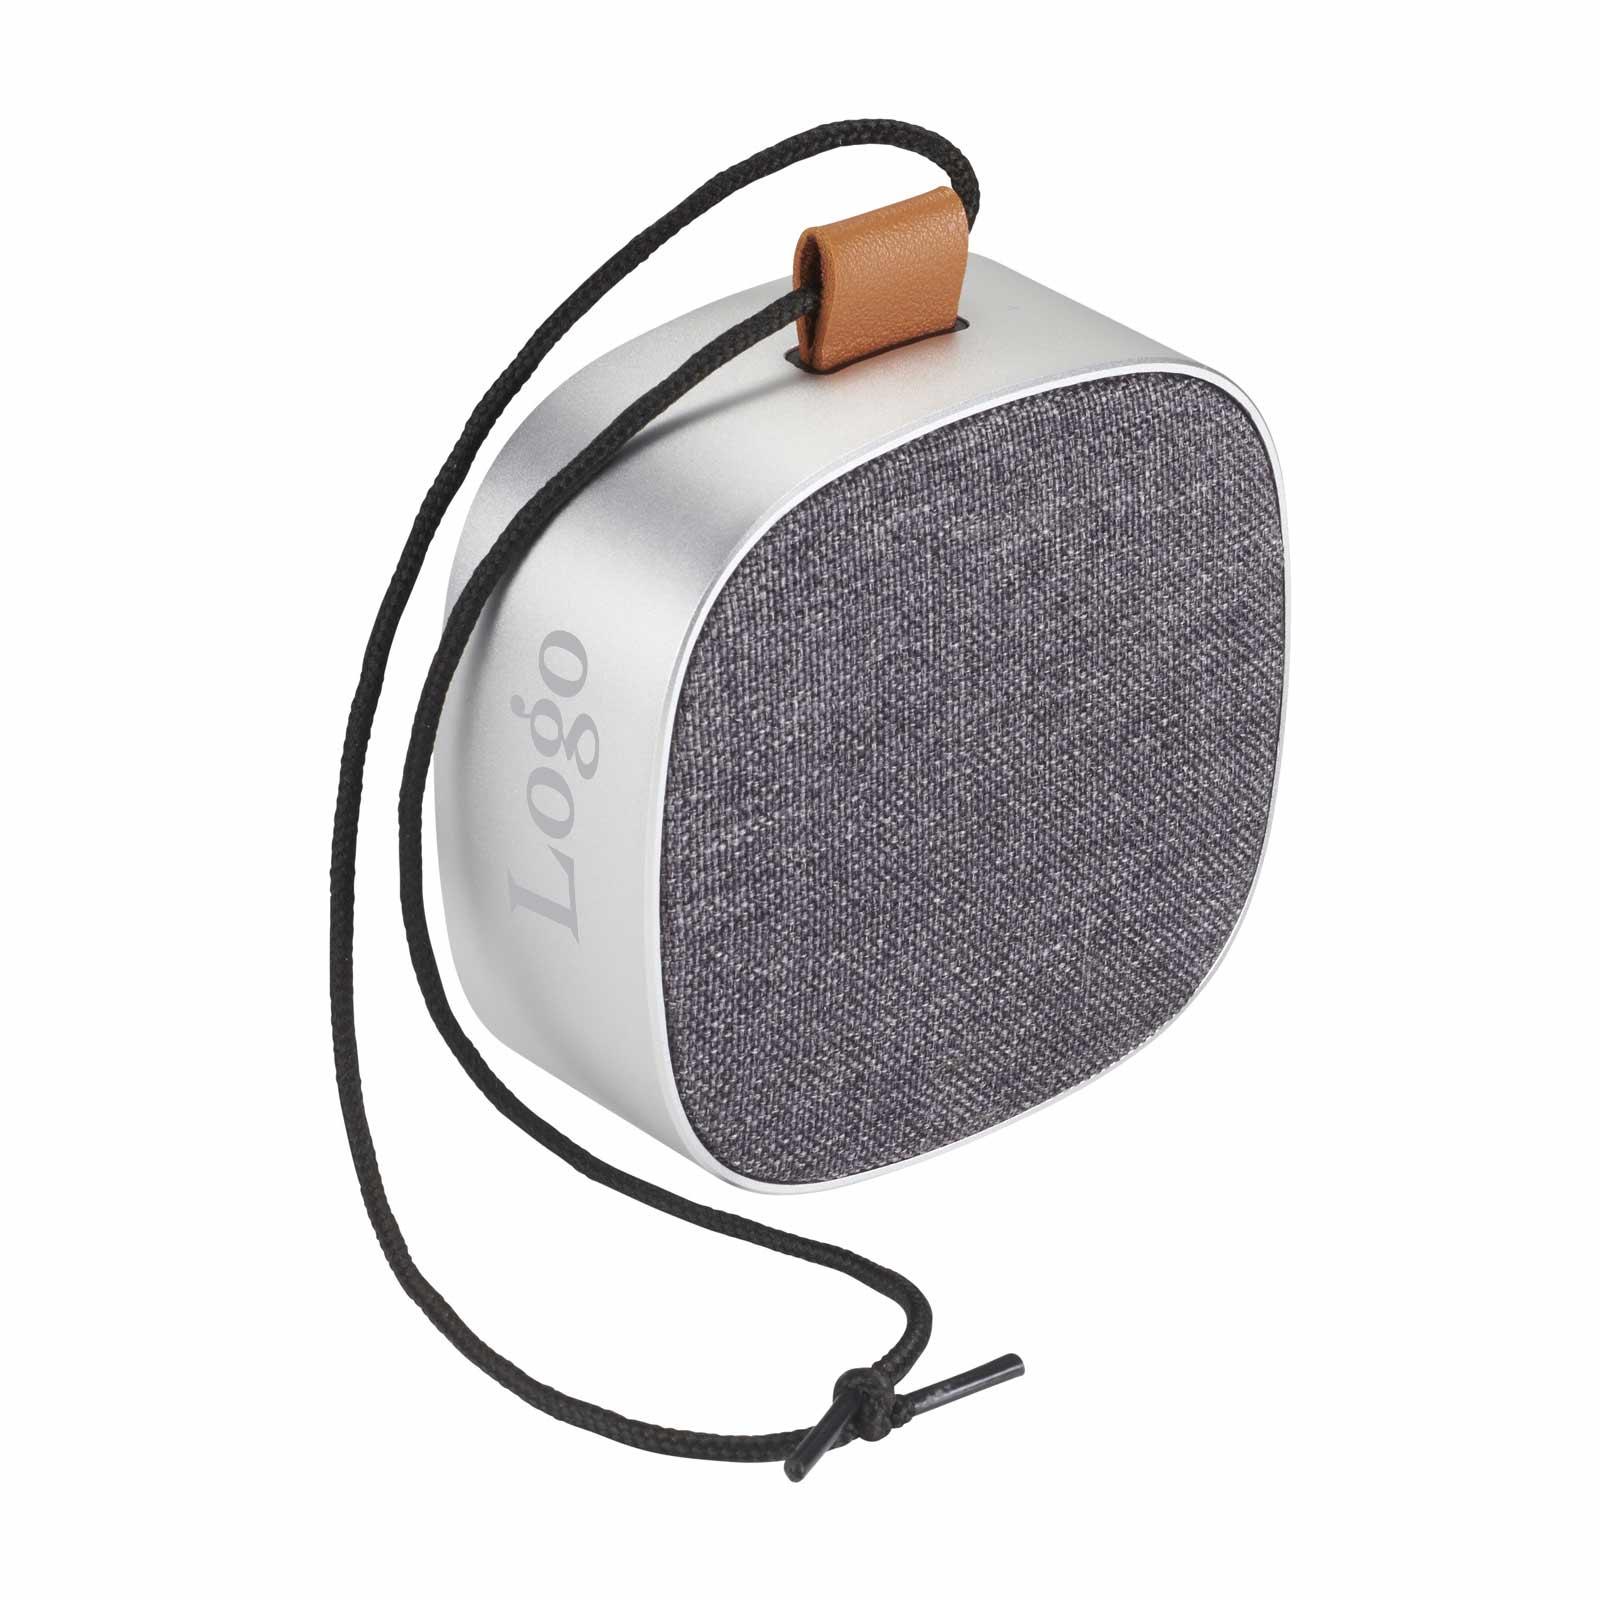 200406 shasta bluetooth speaker laser engraved on side of speaker